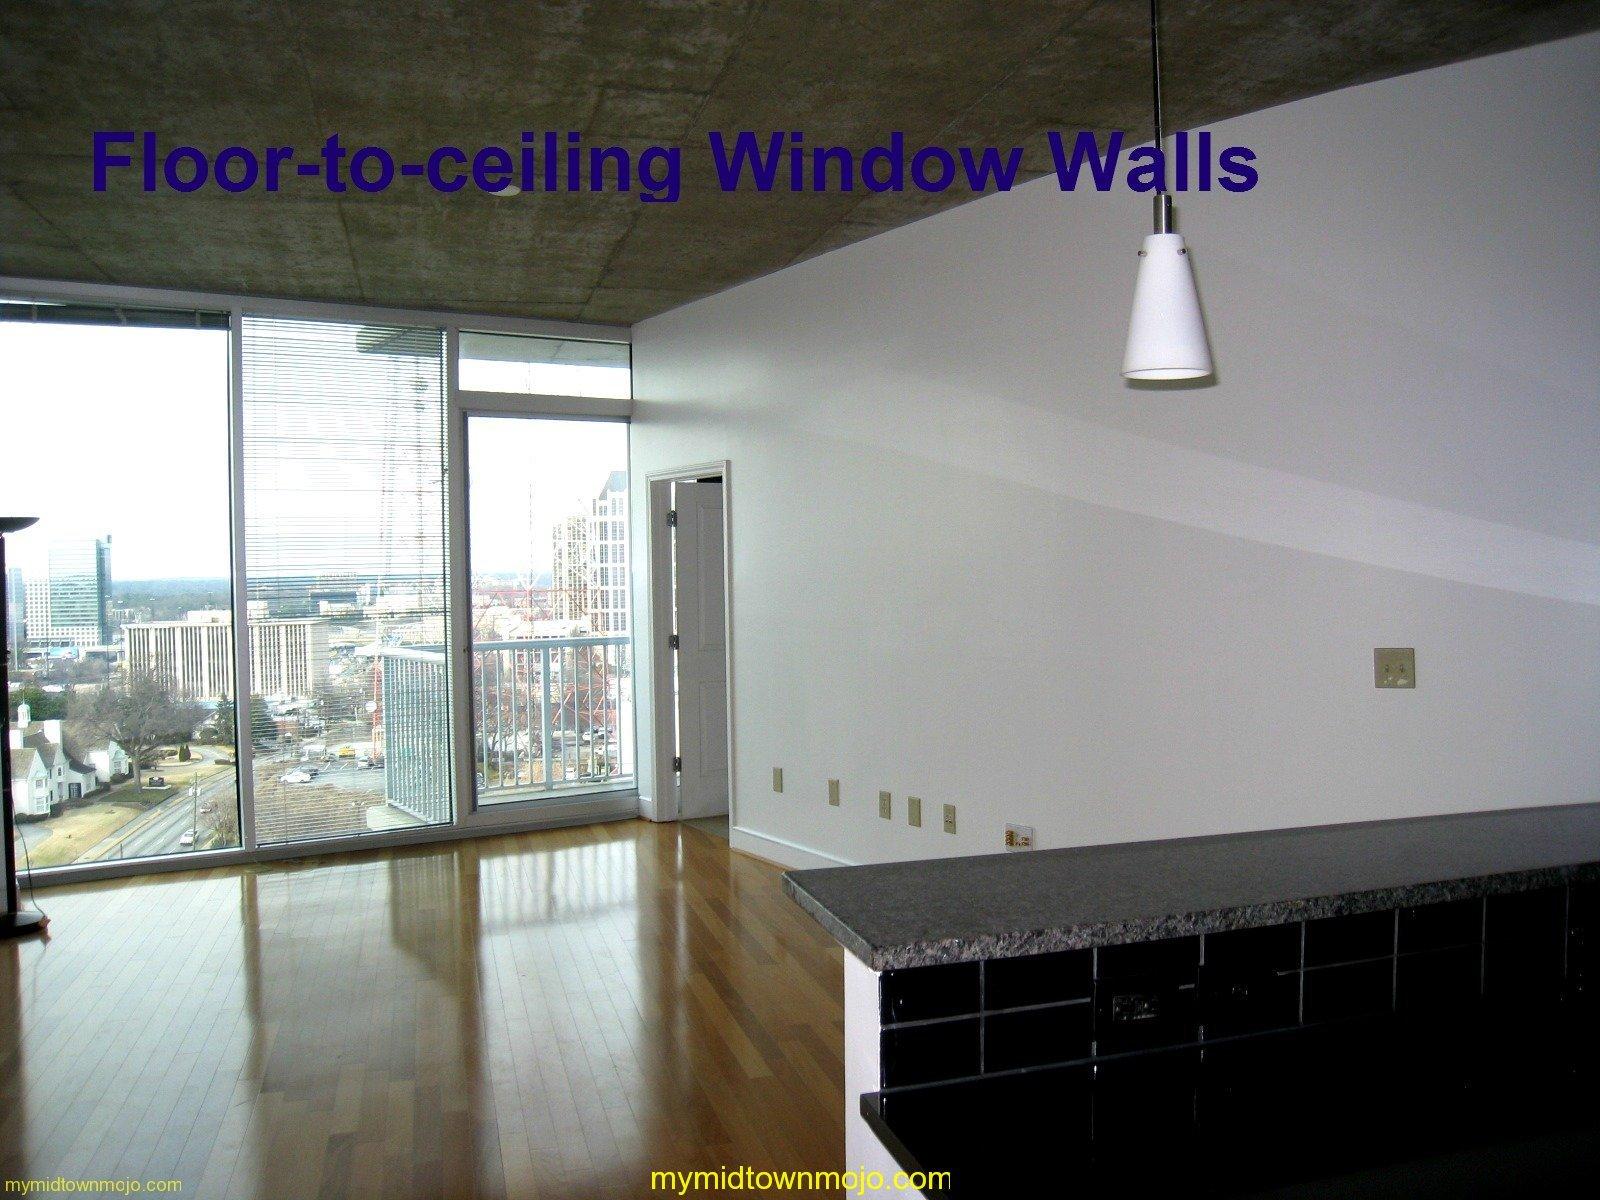 plaza-midtown-window-wall